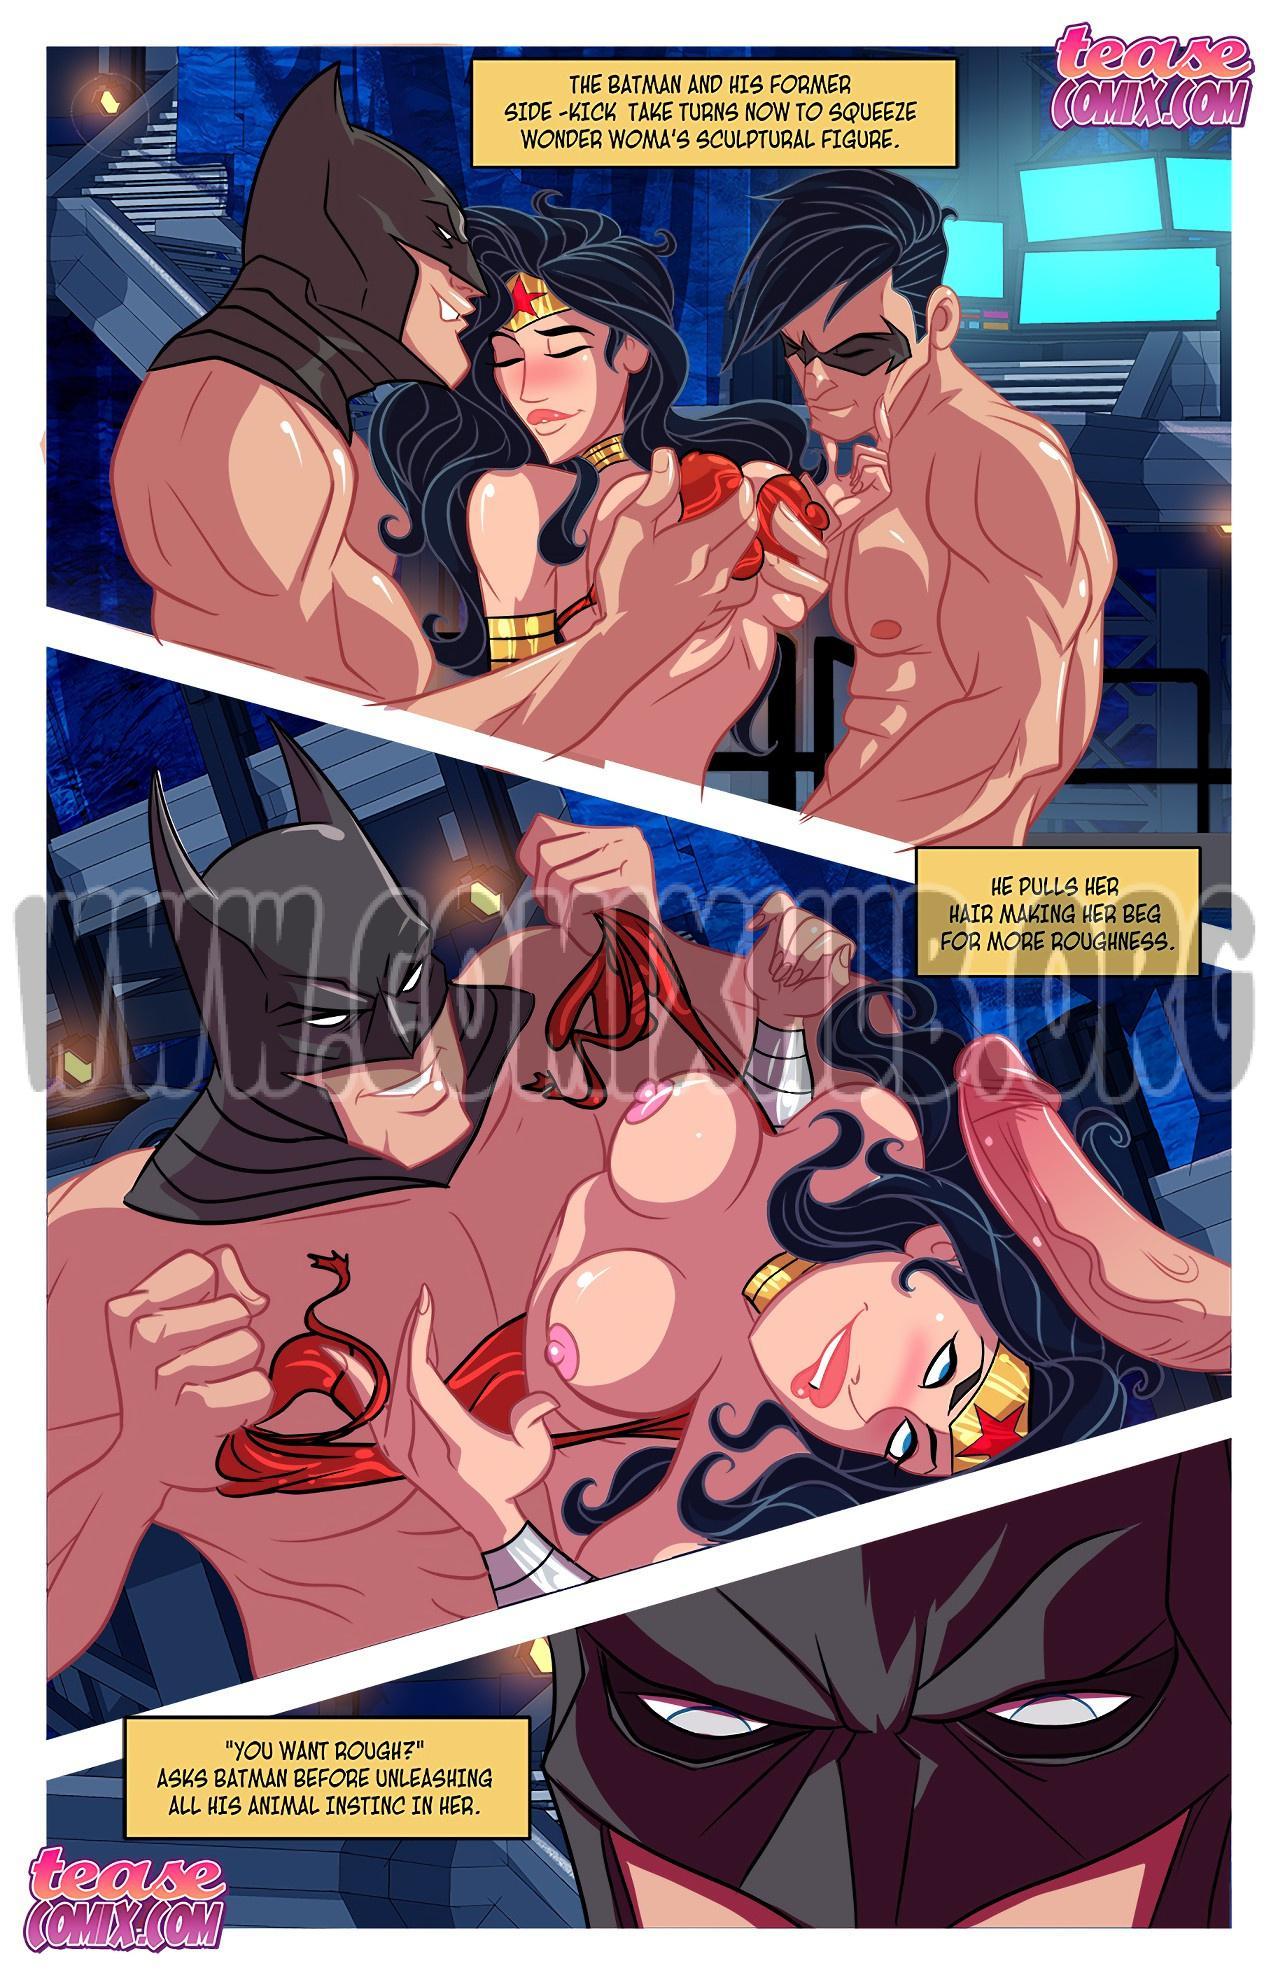 I Want Batcock 2 porn comics Oral sex, Anal Sex, Blowjob, Creampie, cunnilingus, Double Penetration, Masturbation, Stockings, Straight, Threesome